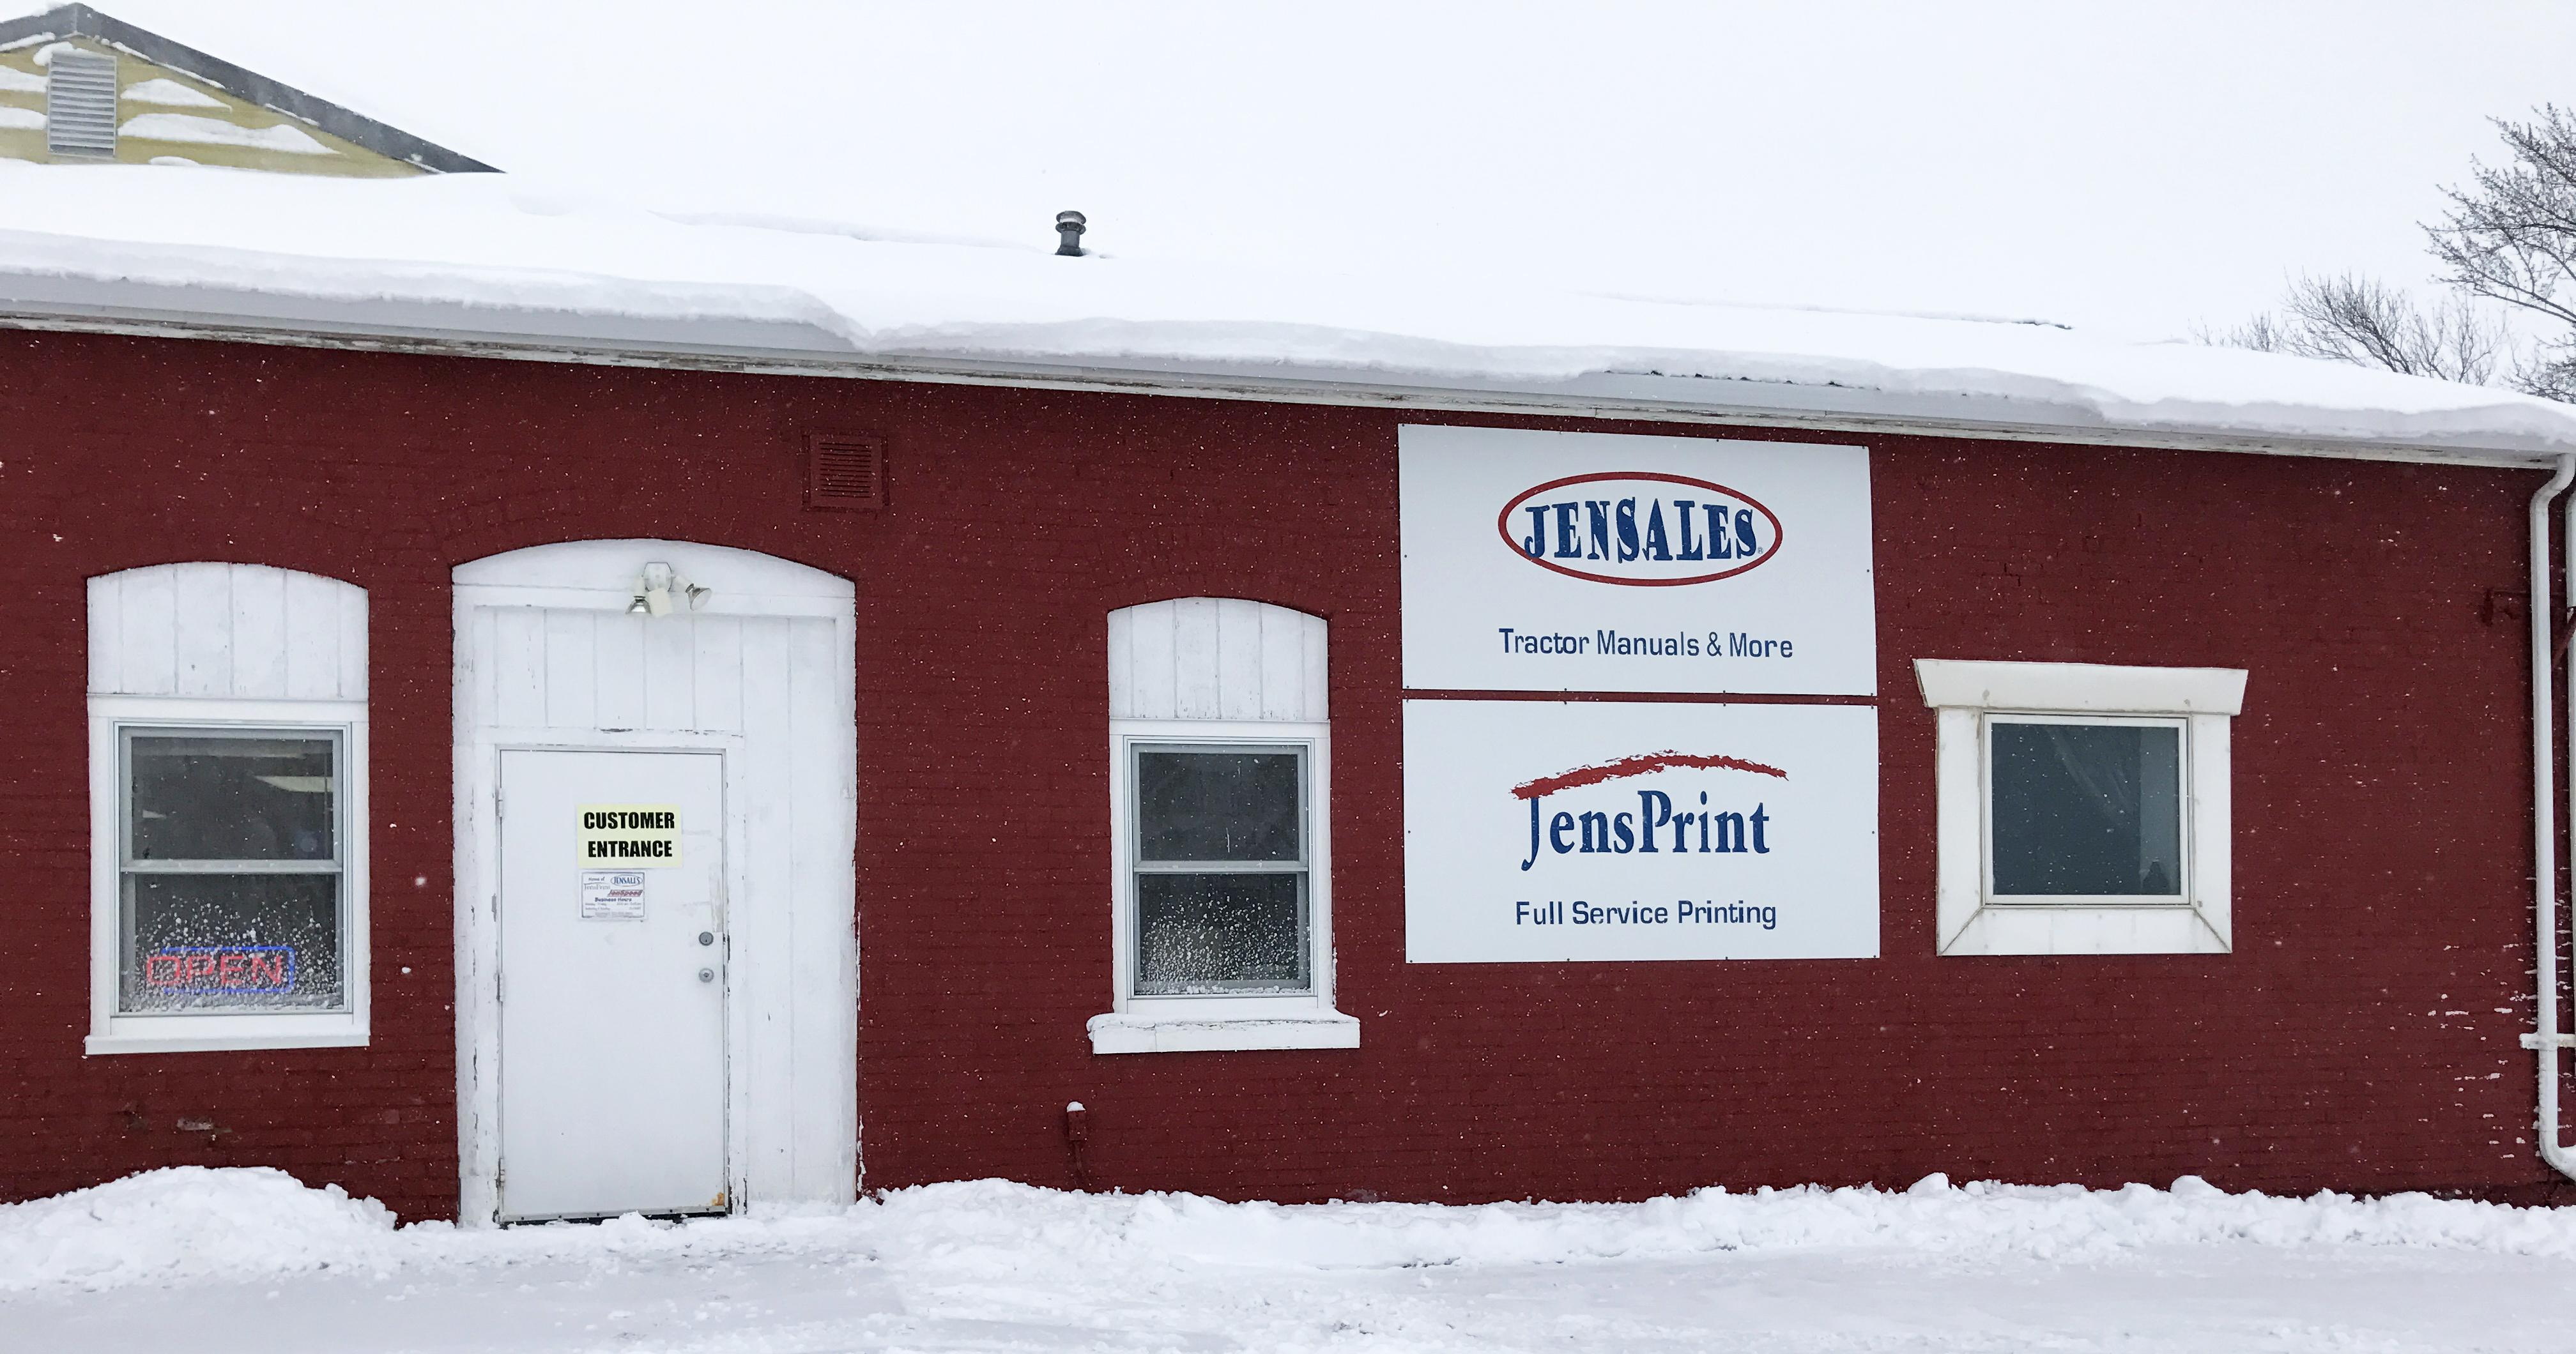 Tractor Manuals | Tractor Parts | Heavy Equipment | Jensales